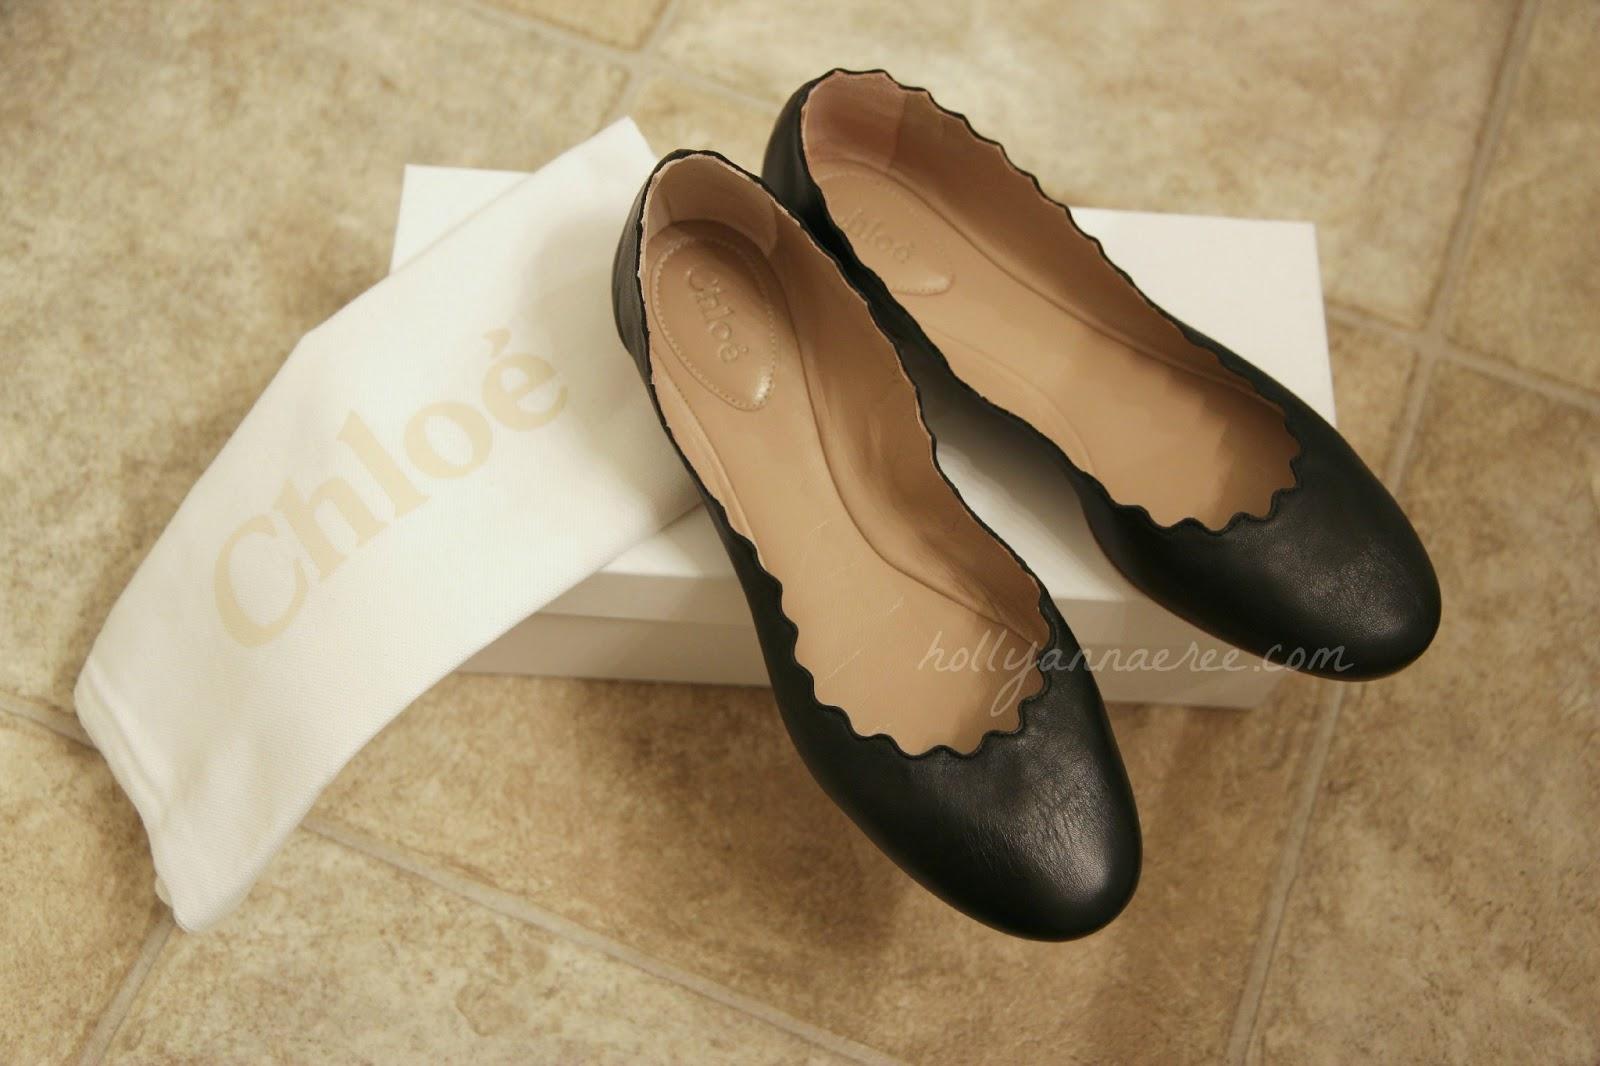 cc67963f3f02 Holly Ann-AeRee 2.0  Chloe Lambskin Flats  Review  Most Comfortable ...